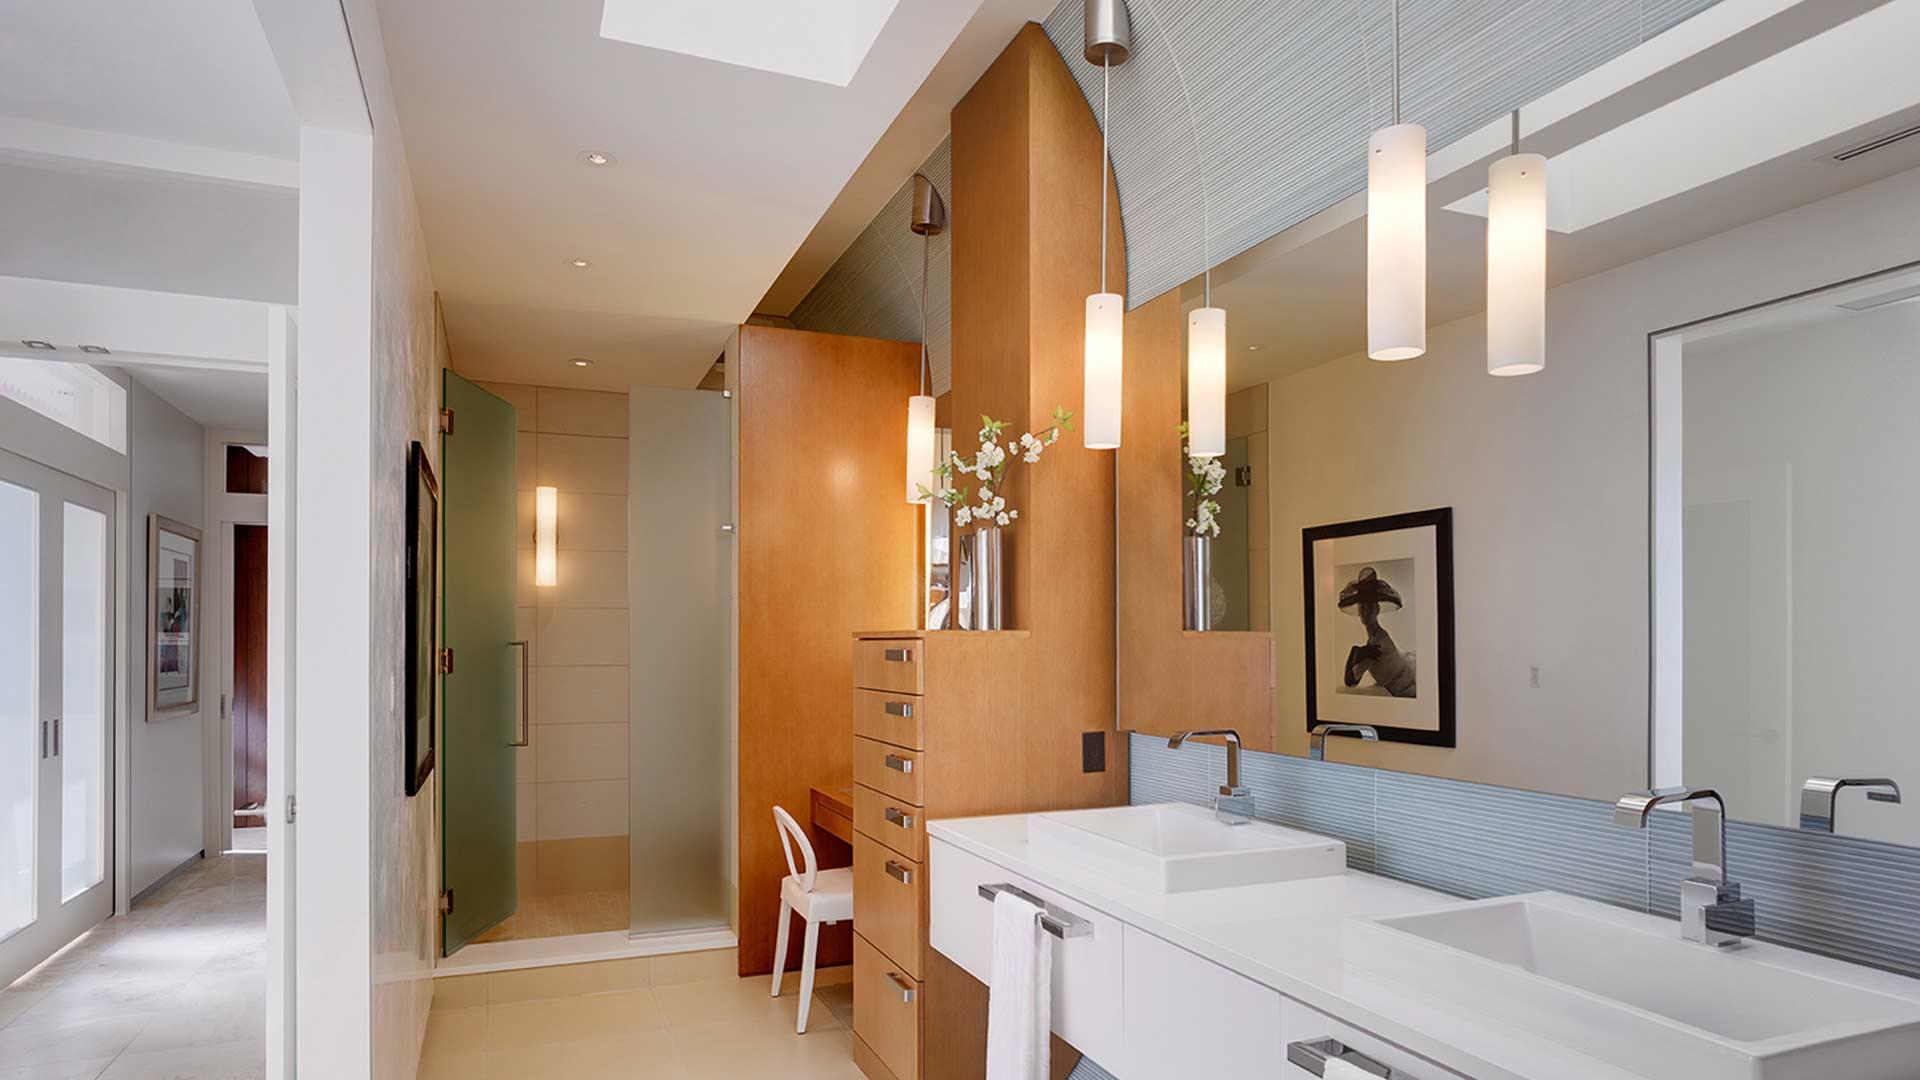 Adagio Penthouse Interior, Master Spa Bathroom, HAUS Architecture, Christopher Short, Indianapolis Architect